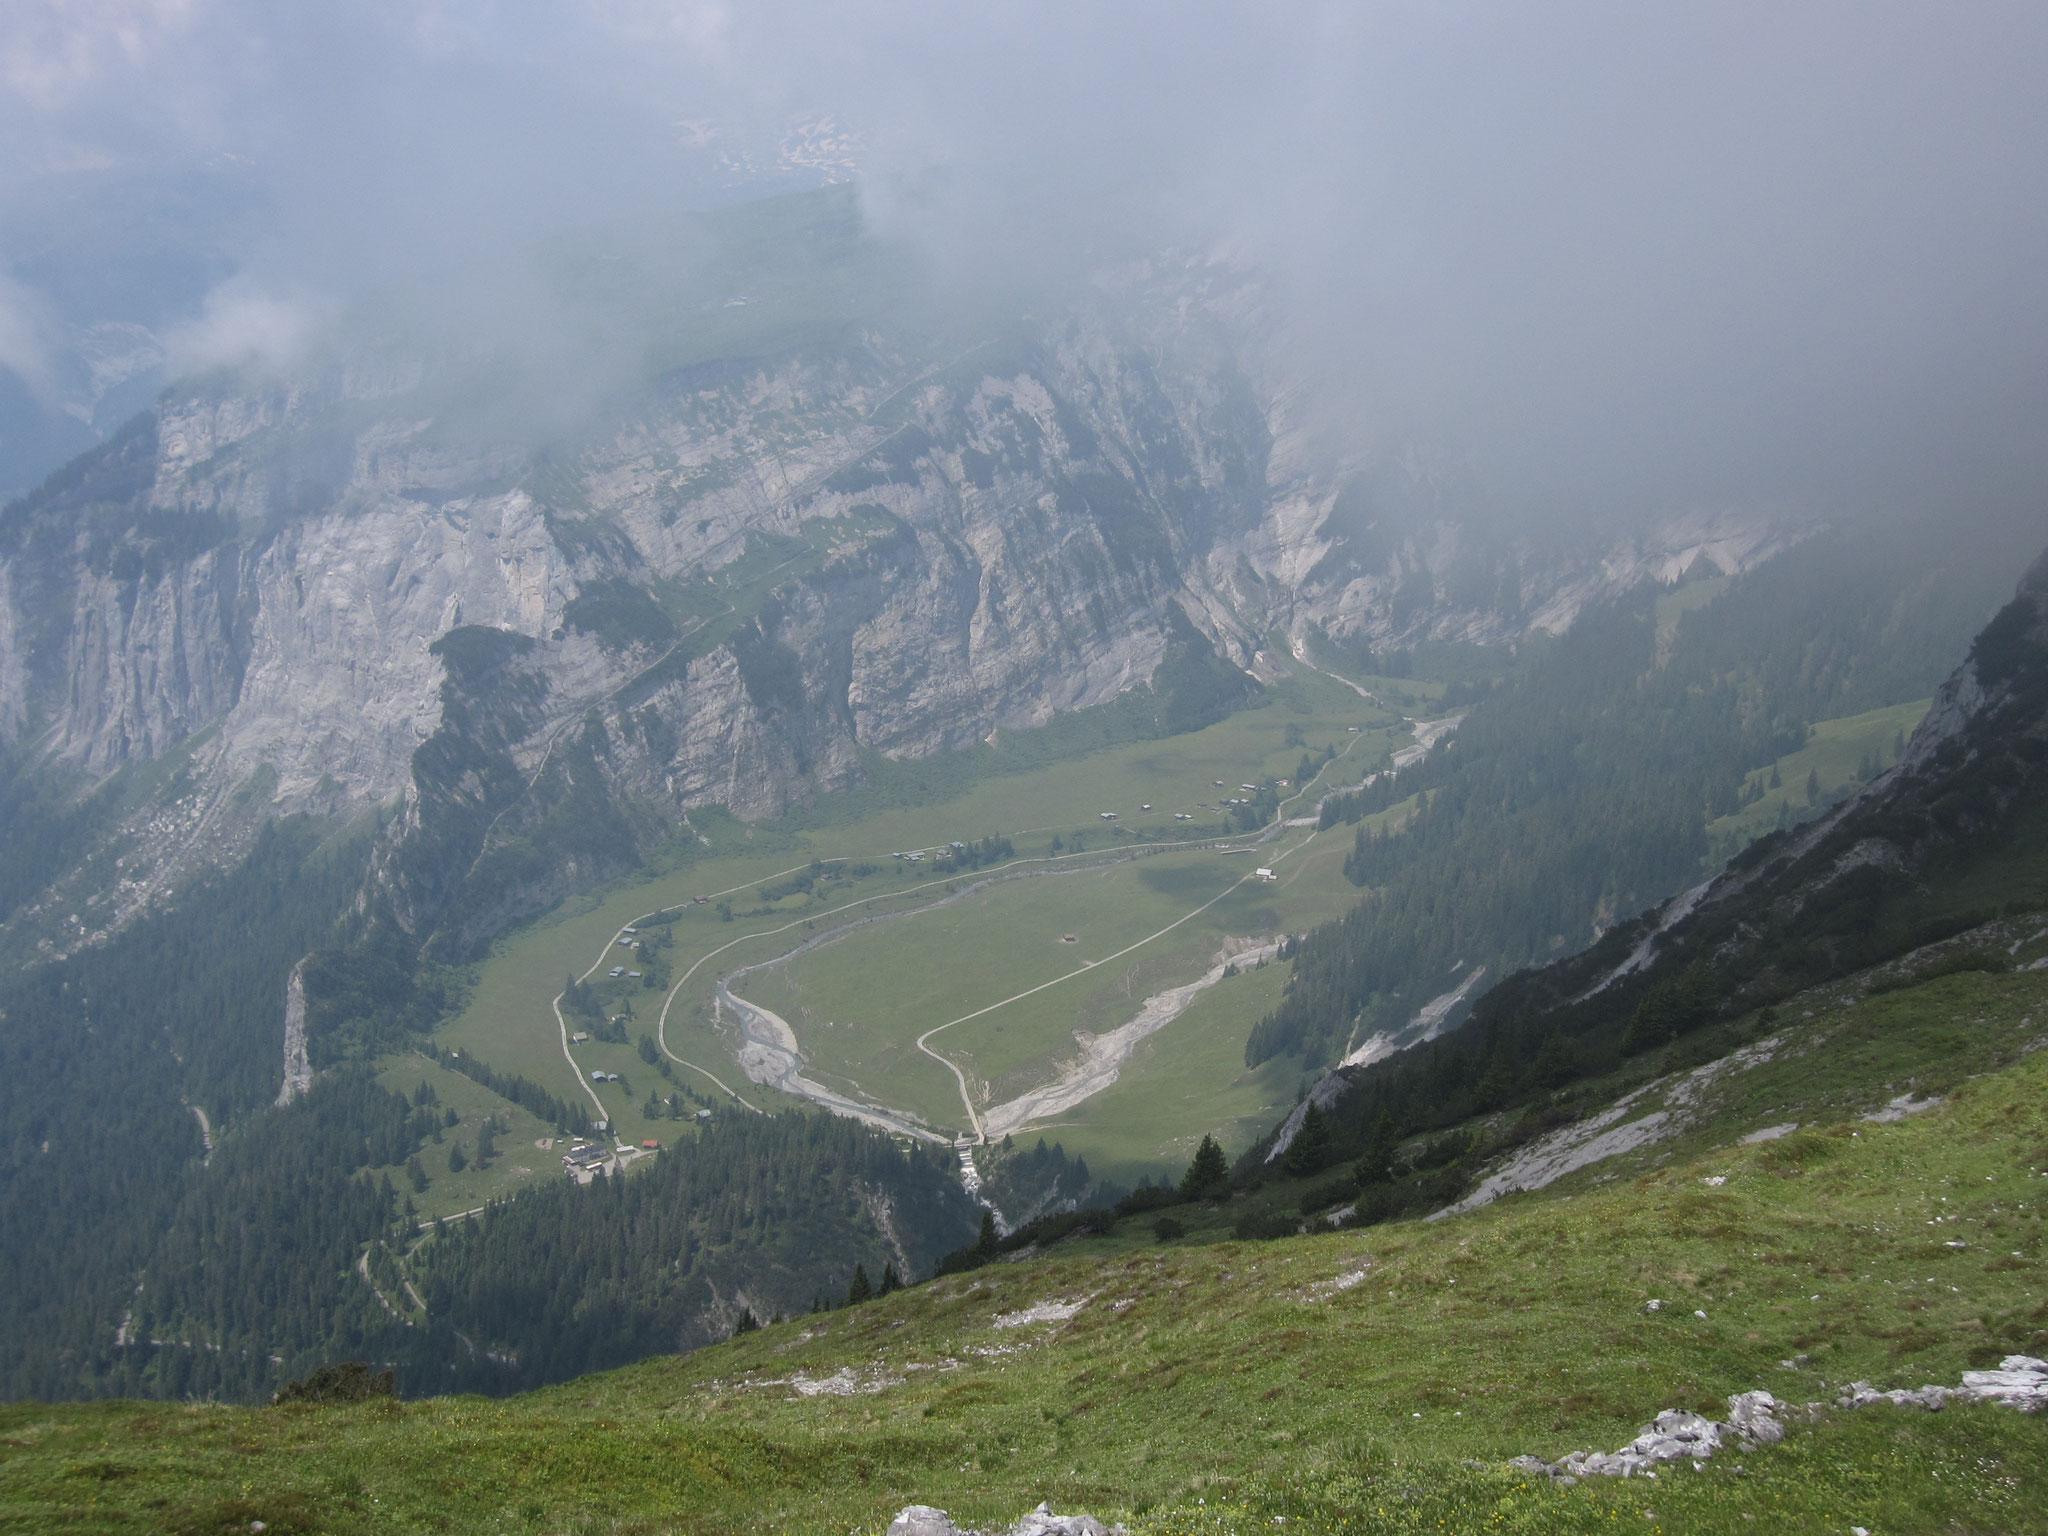 Alp Mora - Bargis GR 23.7.2013